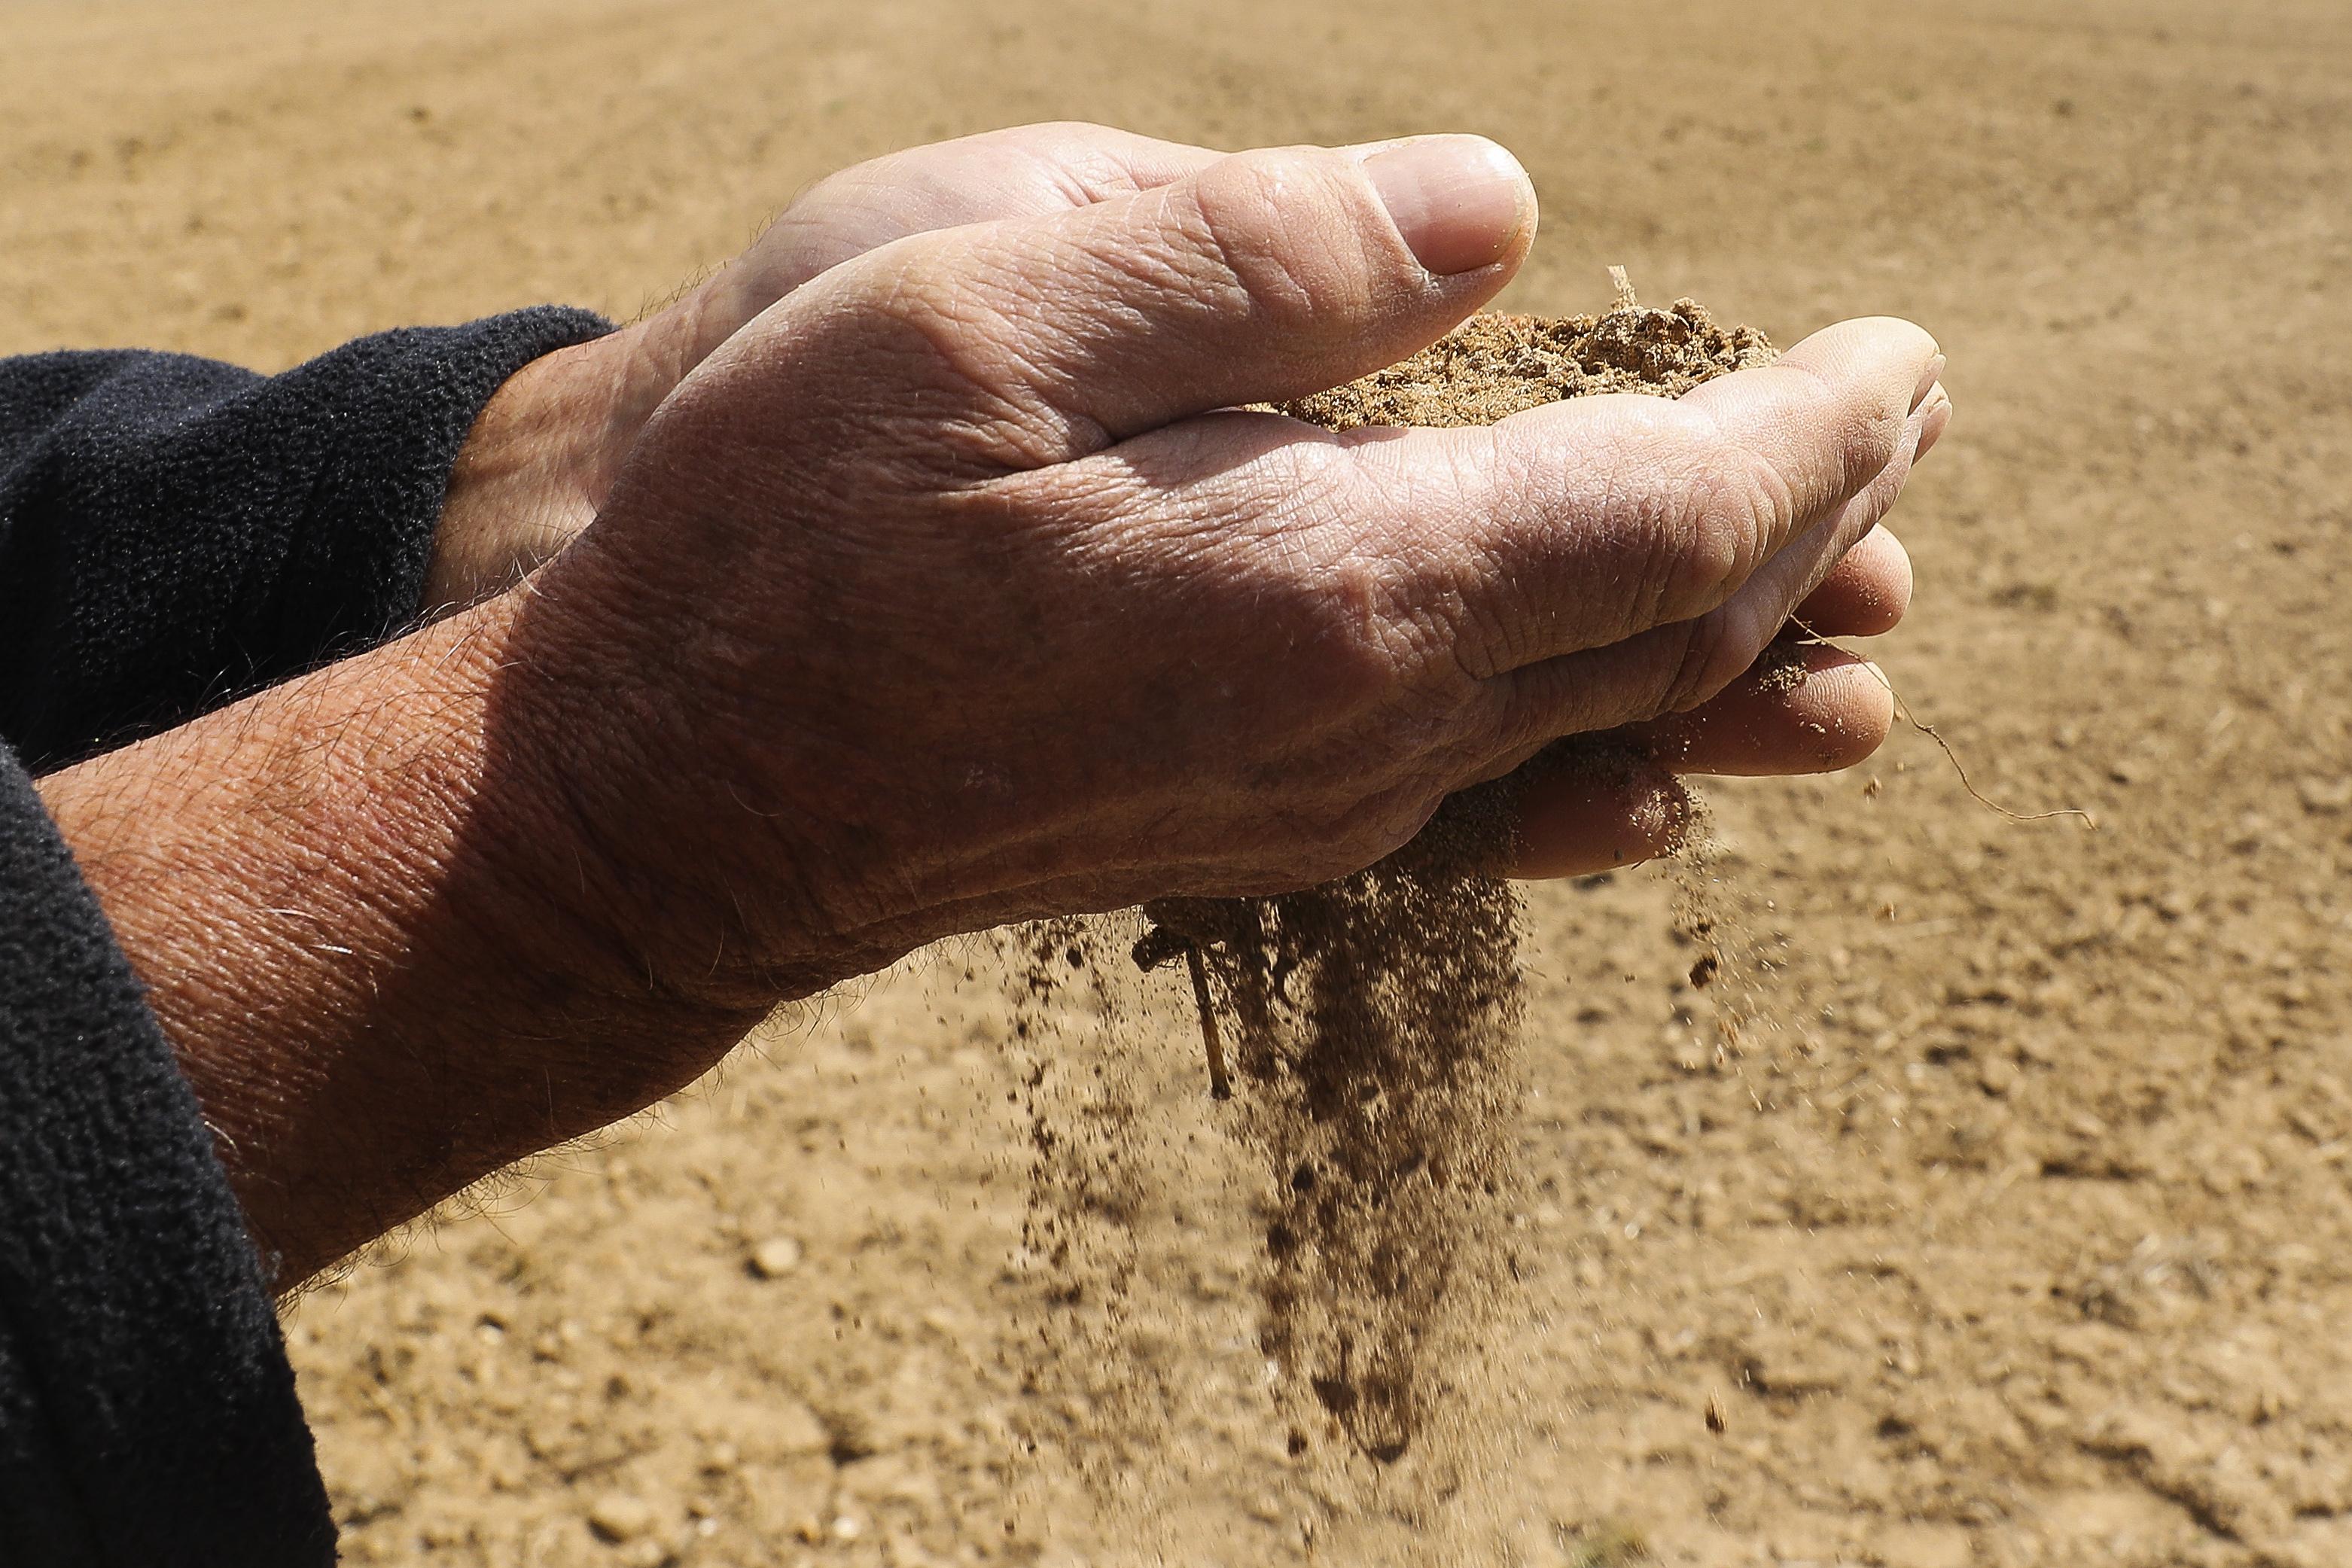 Agricultores do Baixo Alentejo reclamam medidas excecionais